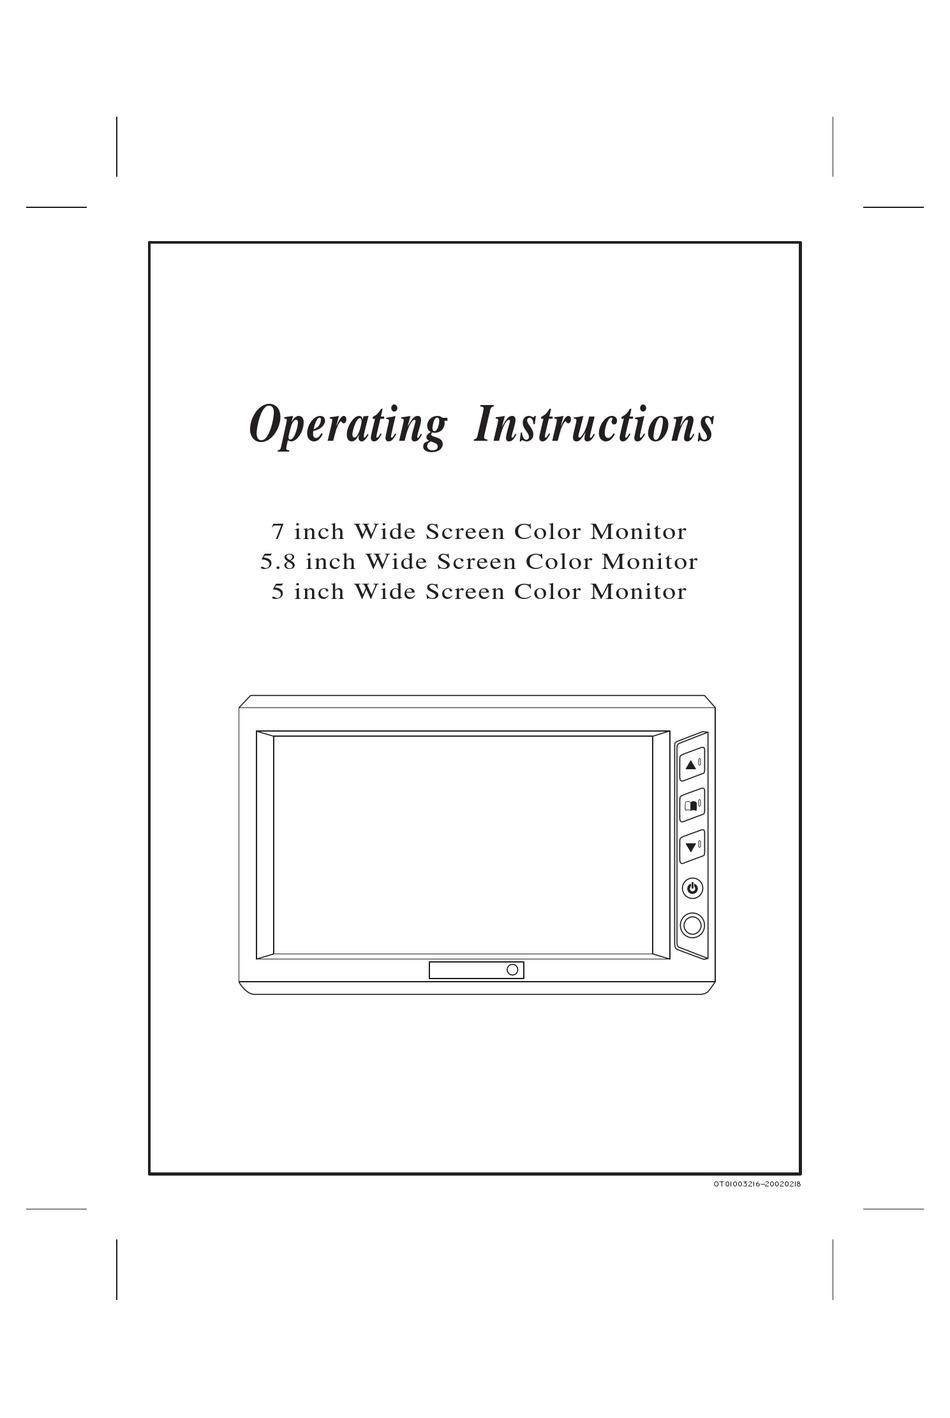 Necvox Fd5869 Operating Instructions